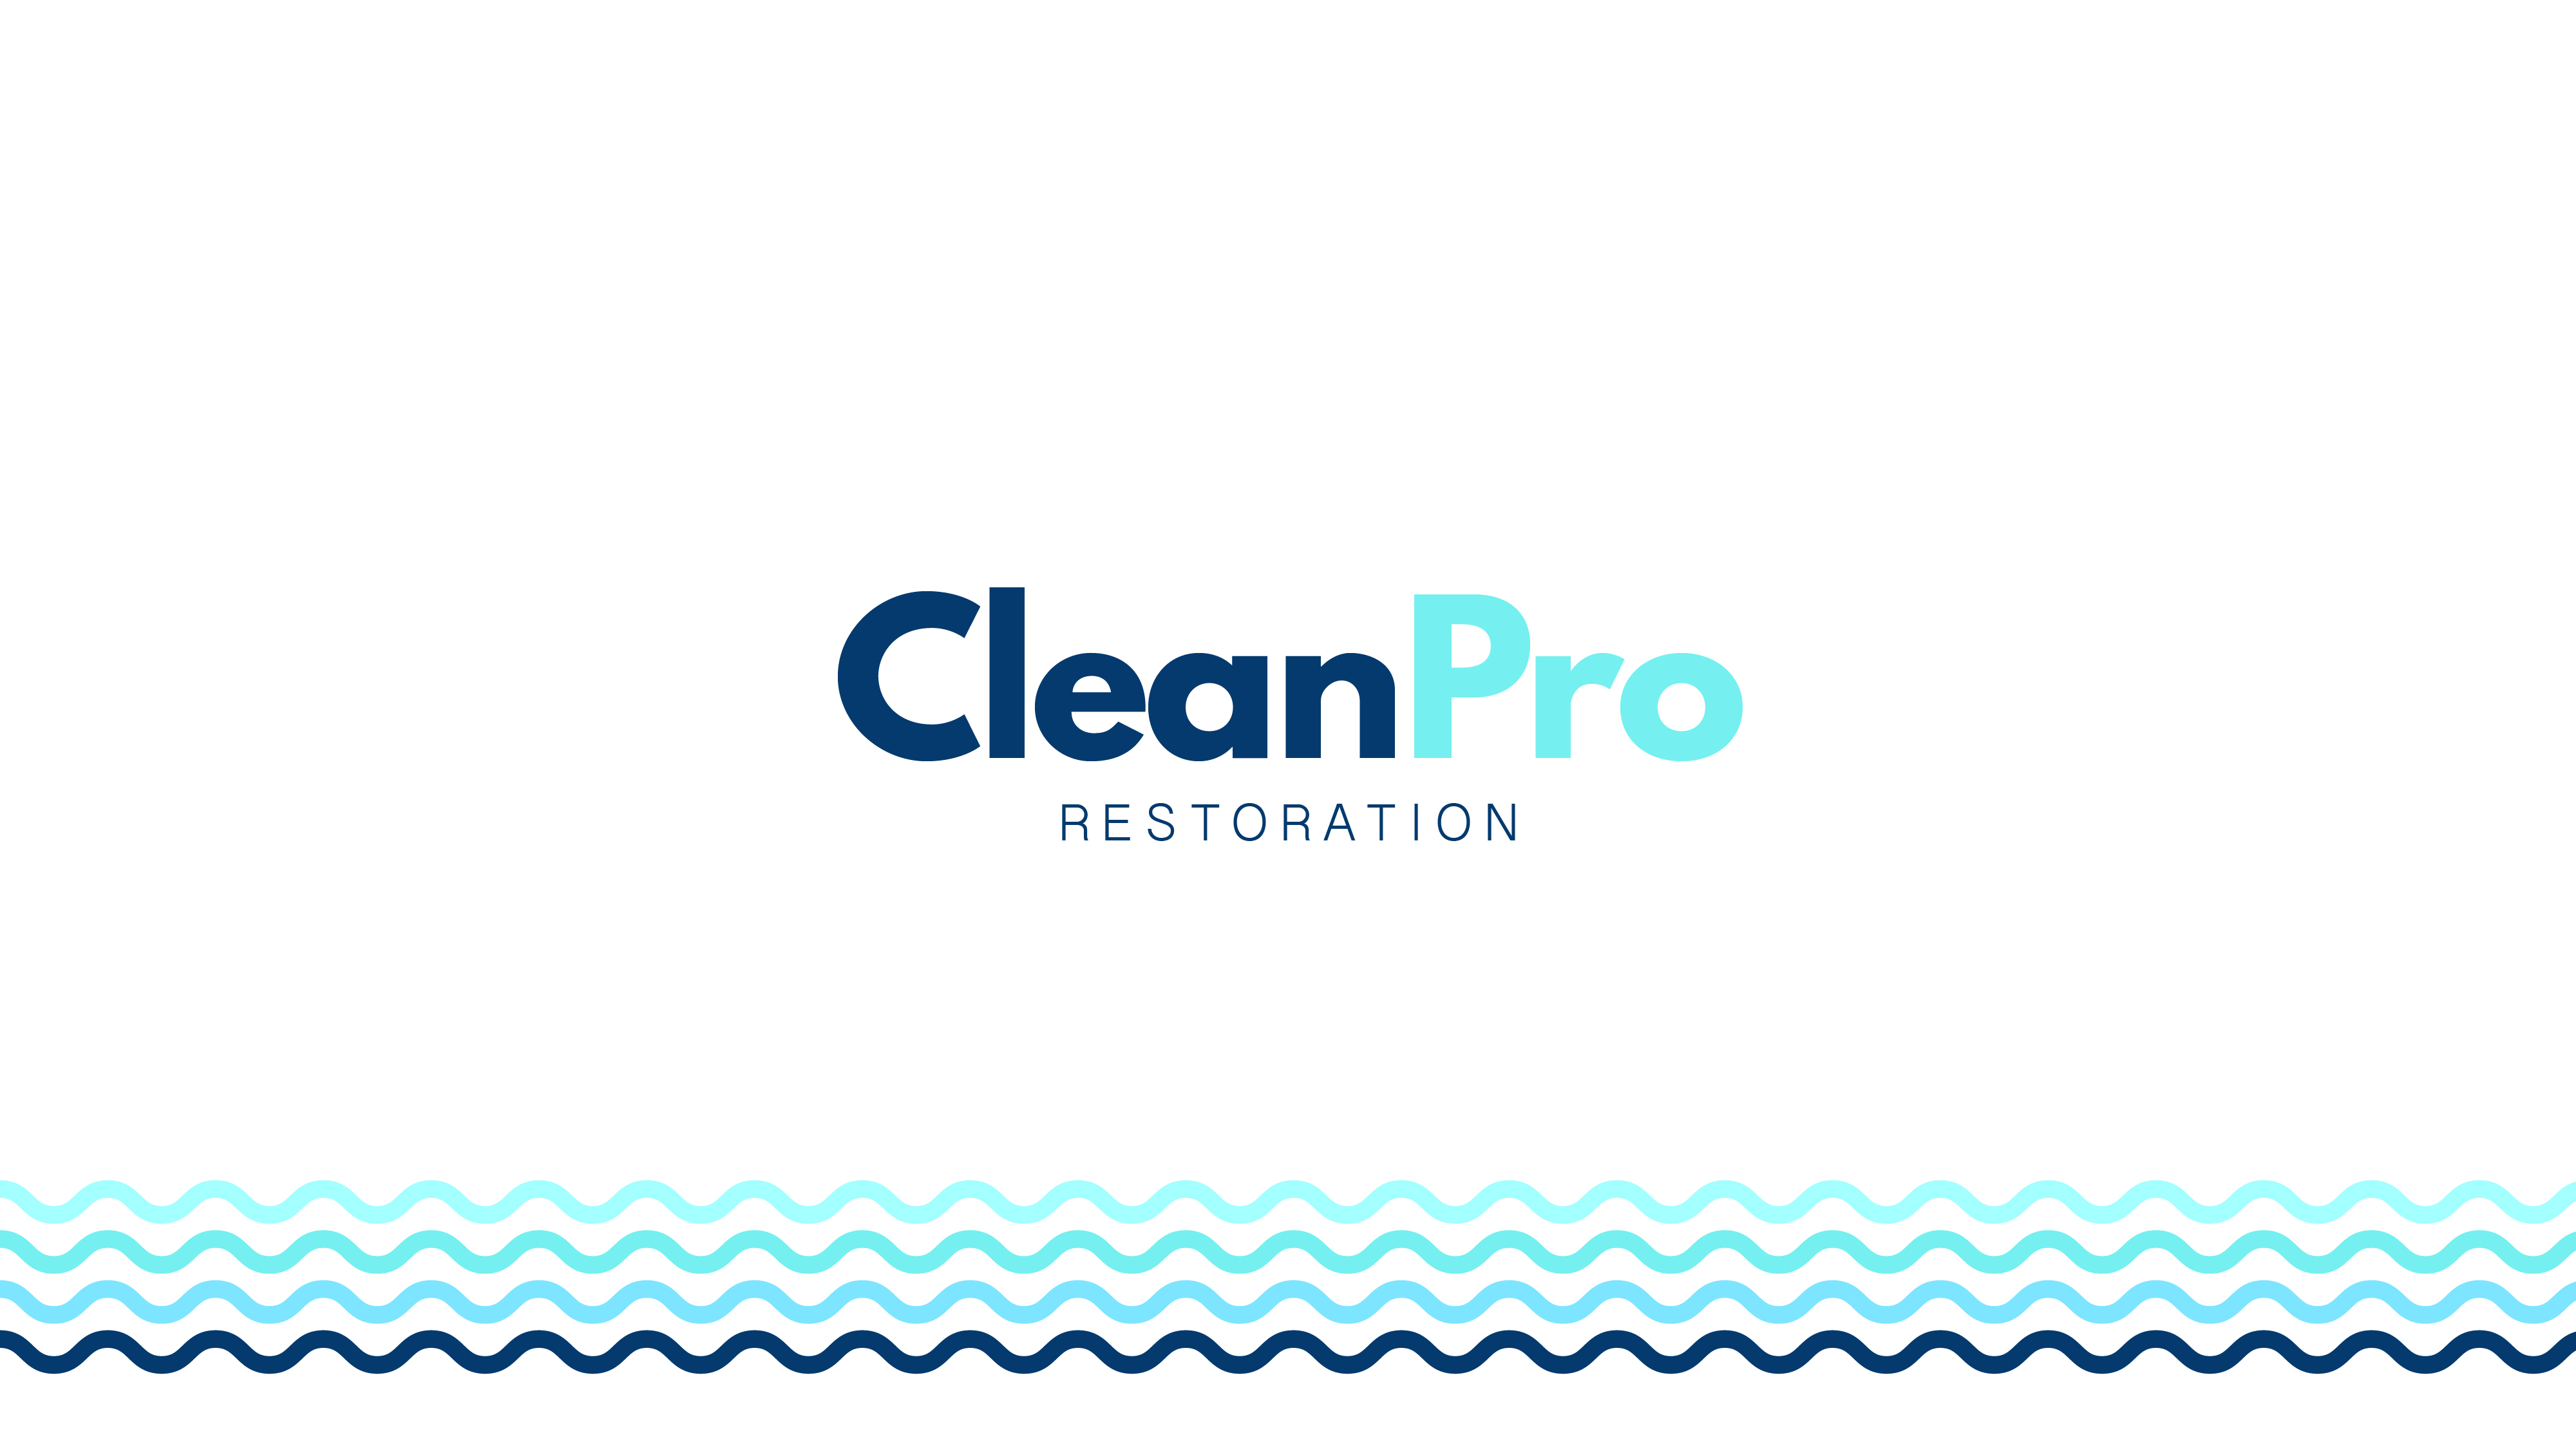 17_05_03_Presentacion_Clean_Pro_Restoration-11